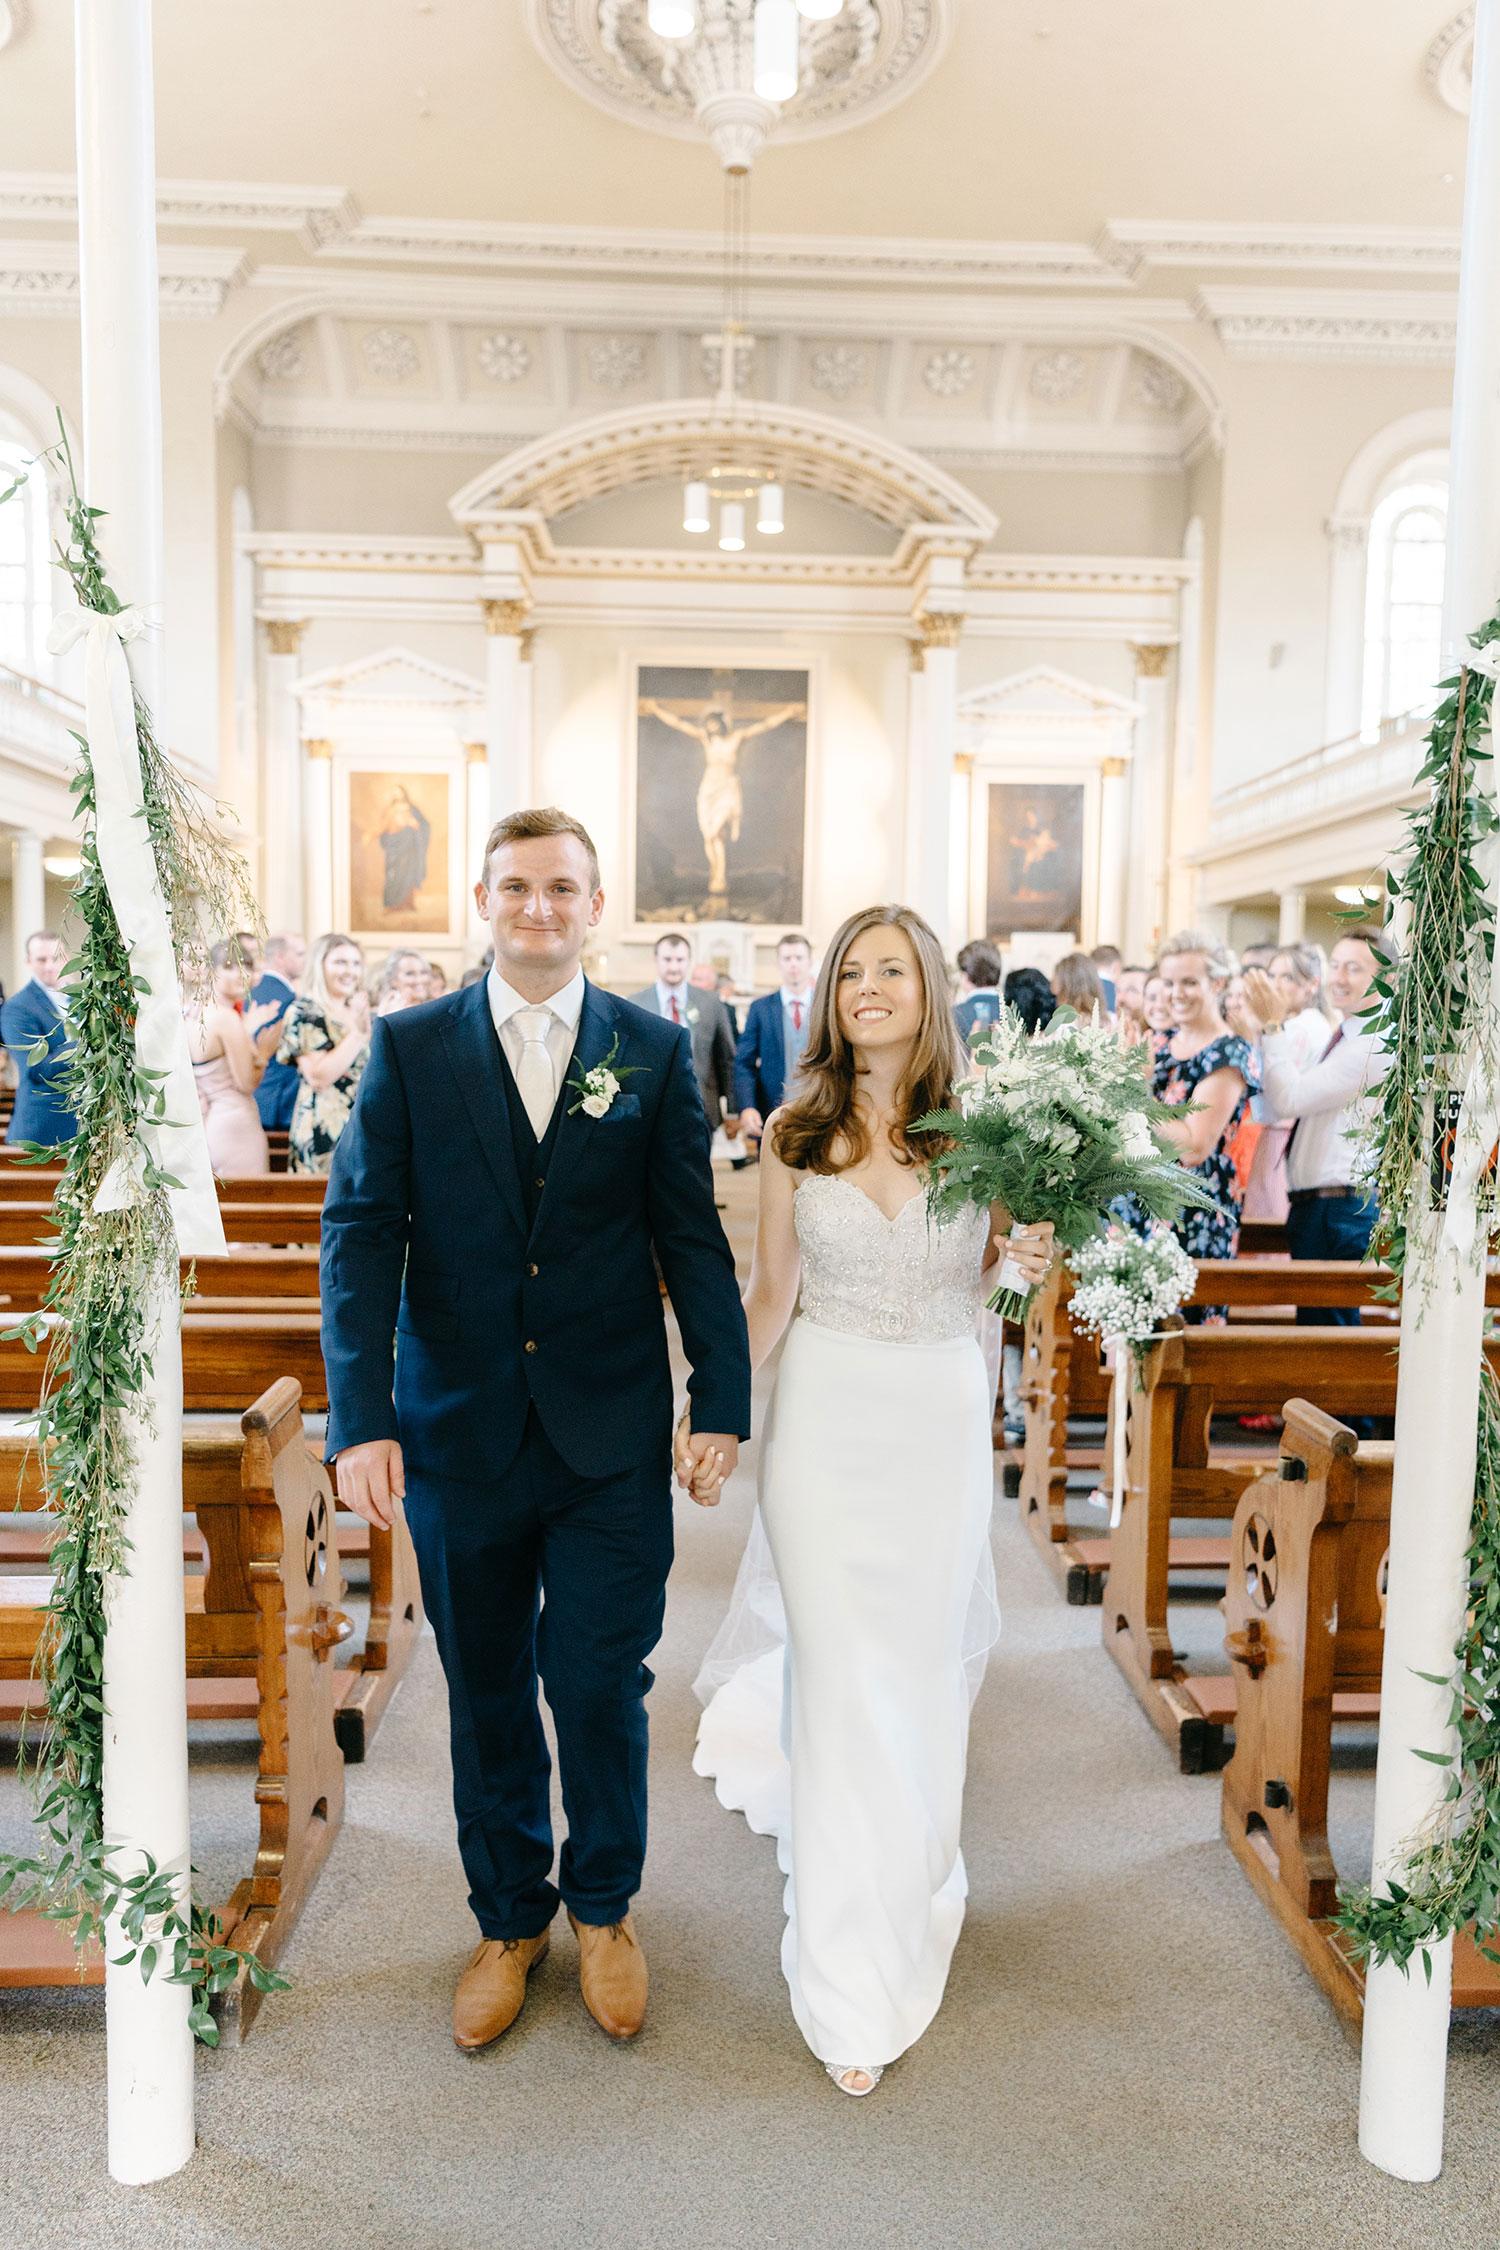 destination-wedding-photographer-ballinacurra-house-wedding-20180711_0032.jpg